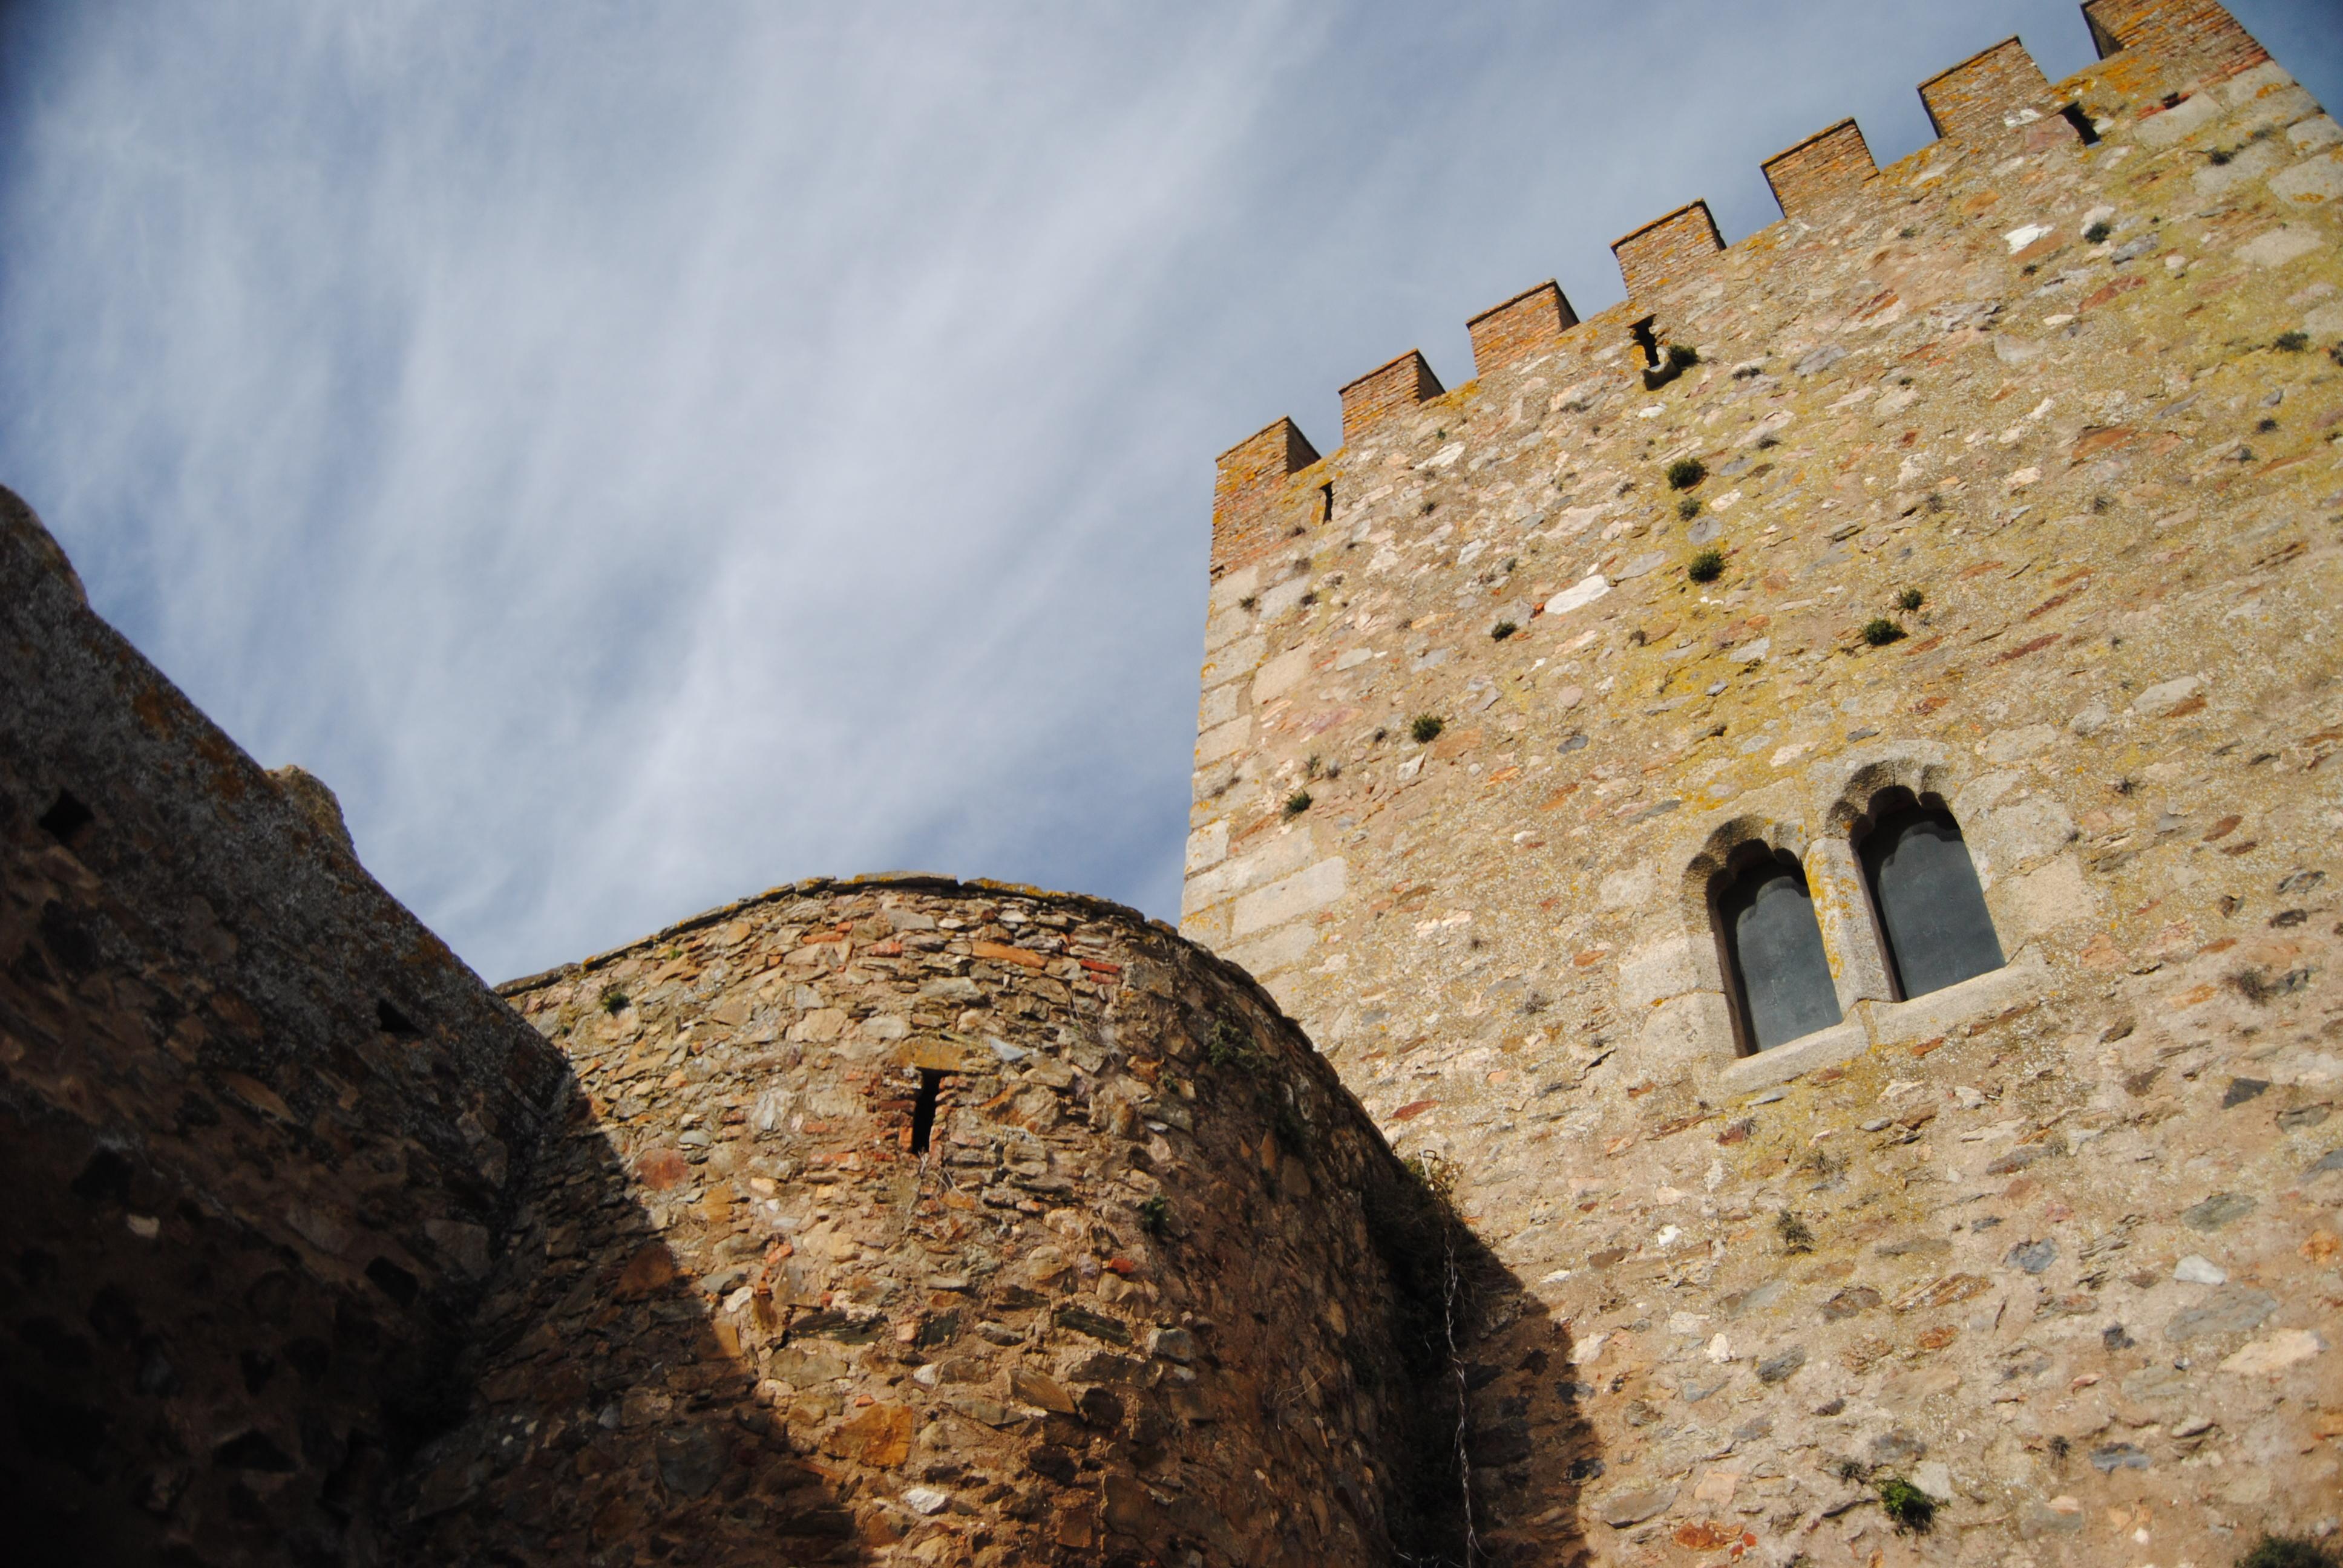 File:Castillo de Segura de León (16055674686).jpg - Wikimedia Commons